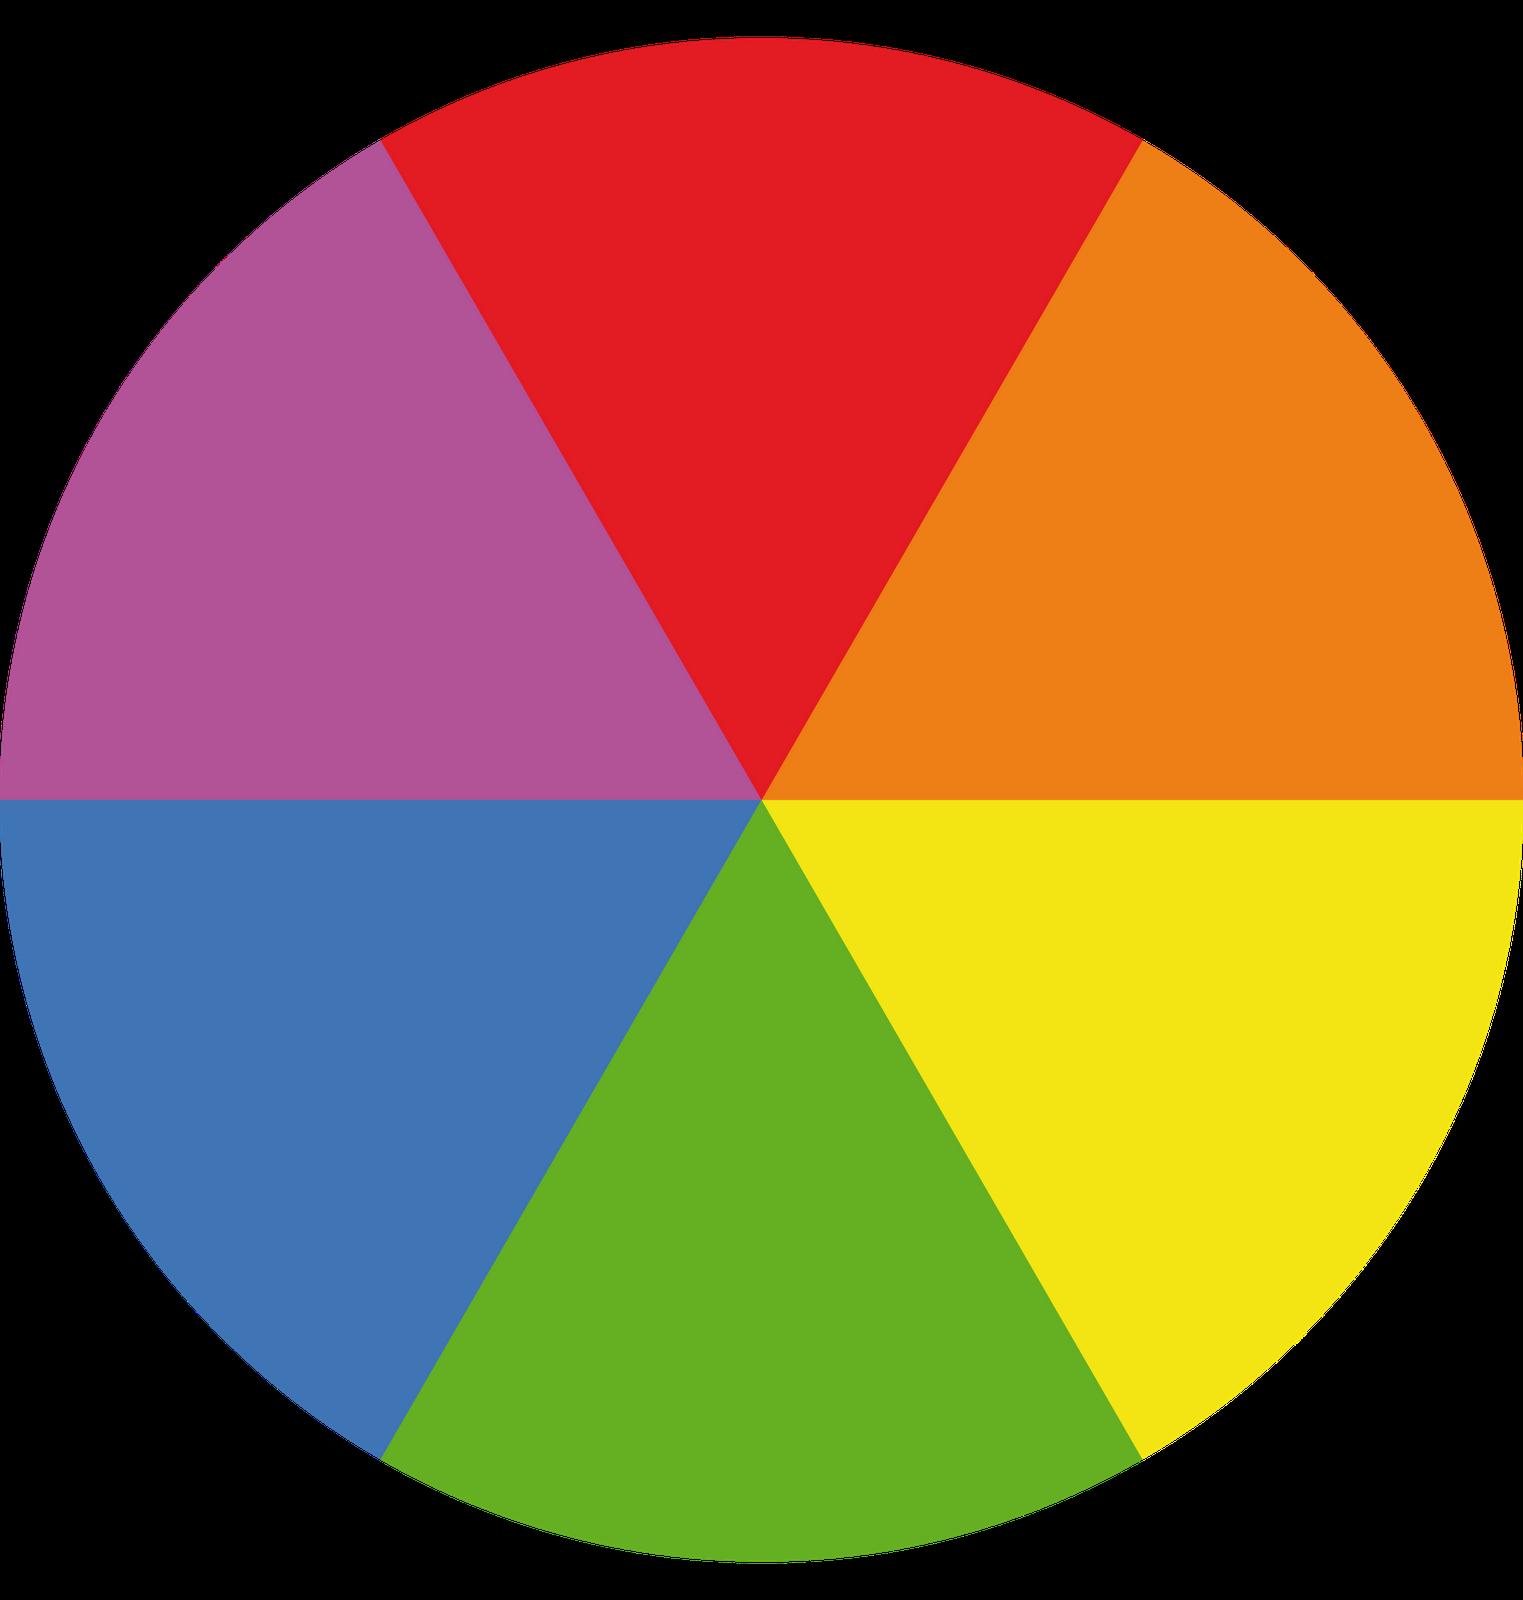 Circulo de colores png imagui for De colores de colores